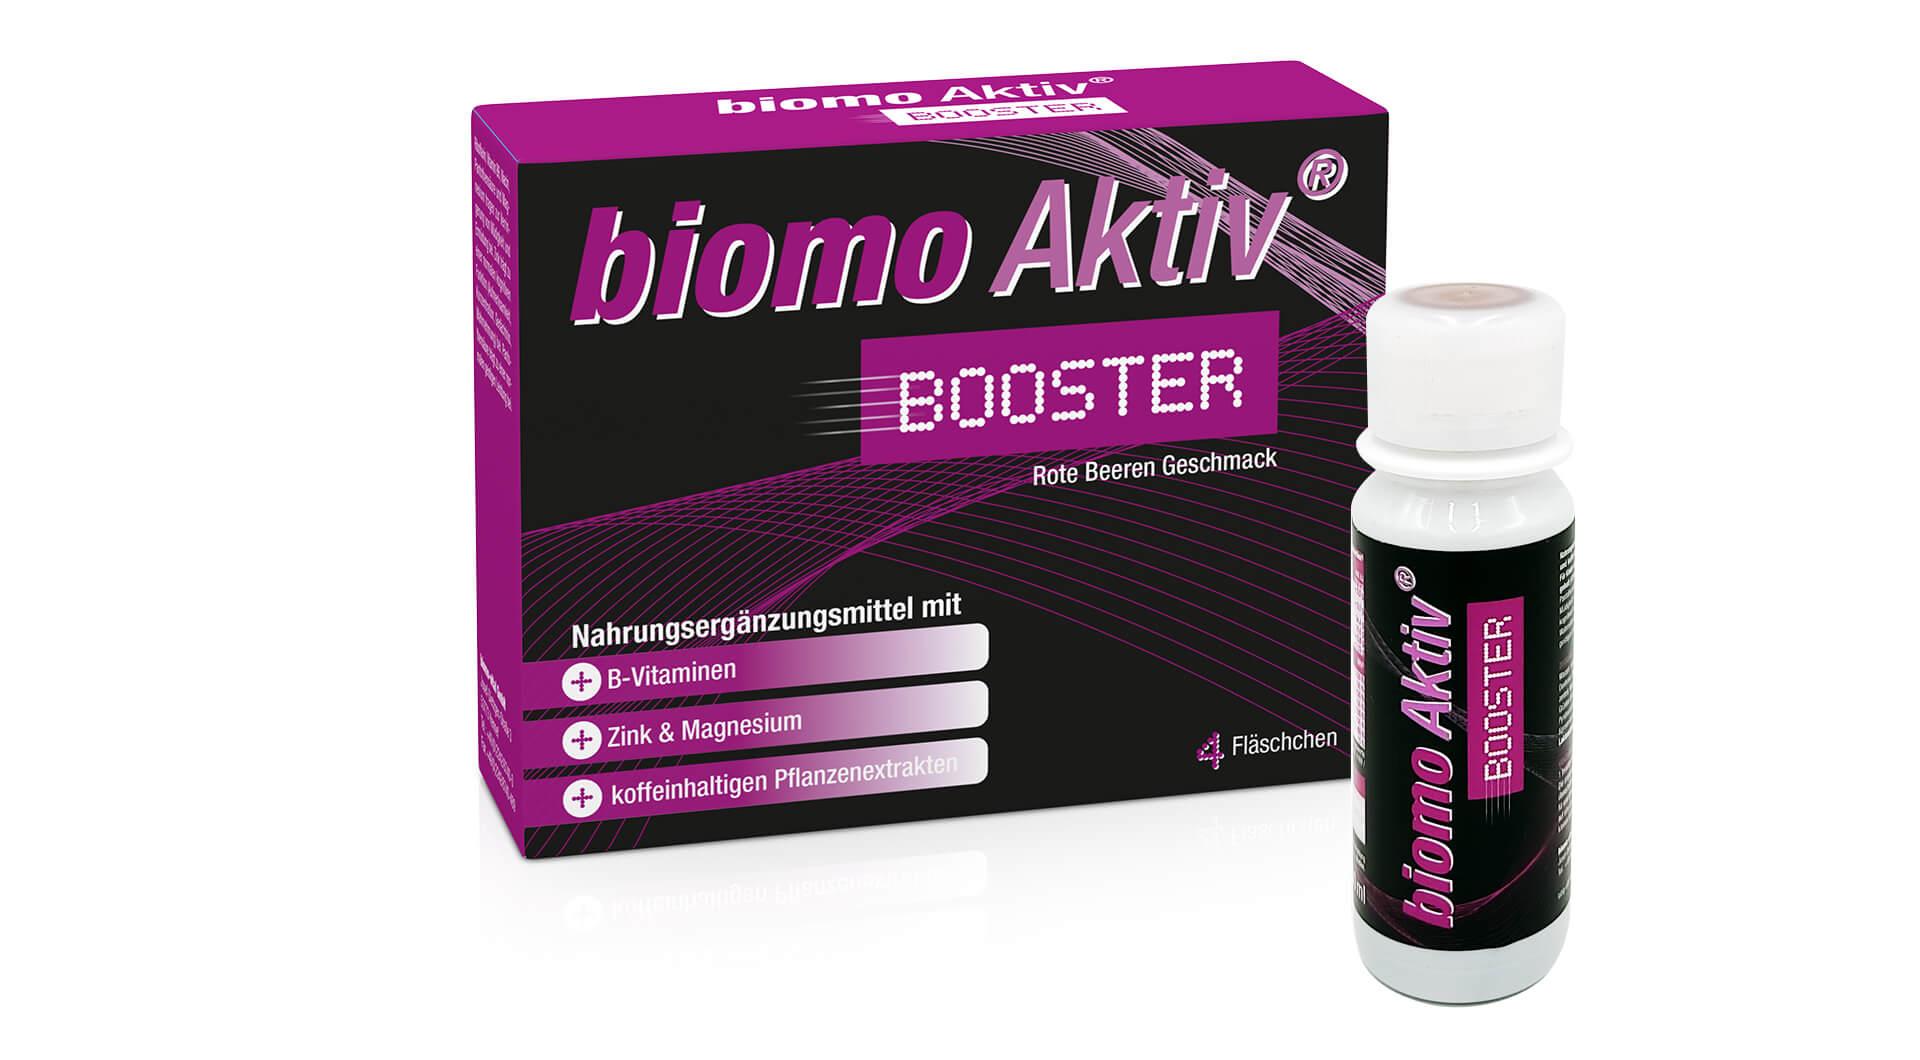 biomo Aktiv Booster